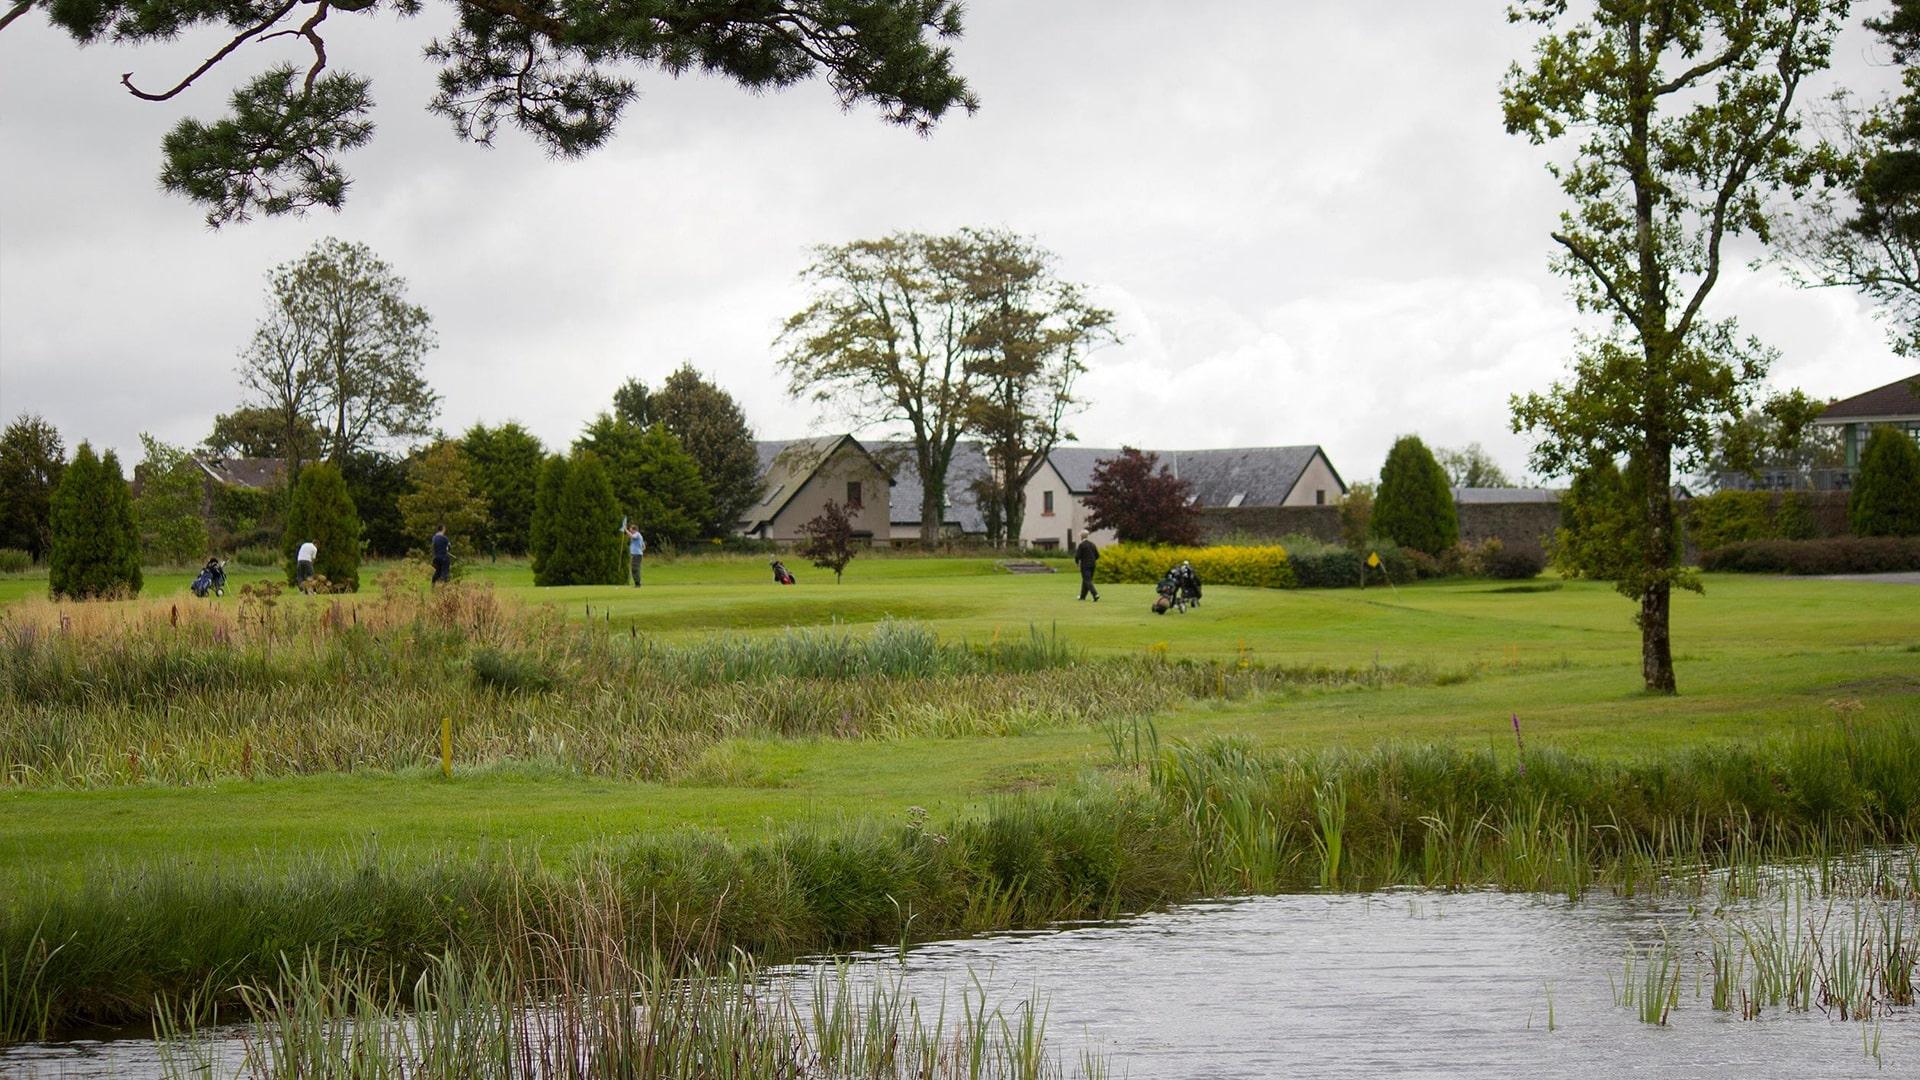 East_Clare_Golf_Village-golf-course-(2)-min